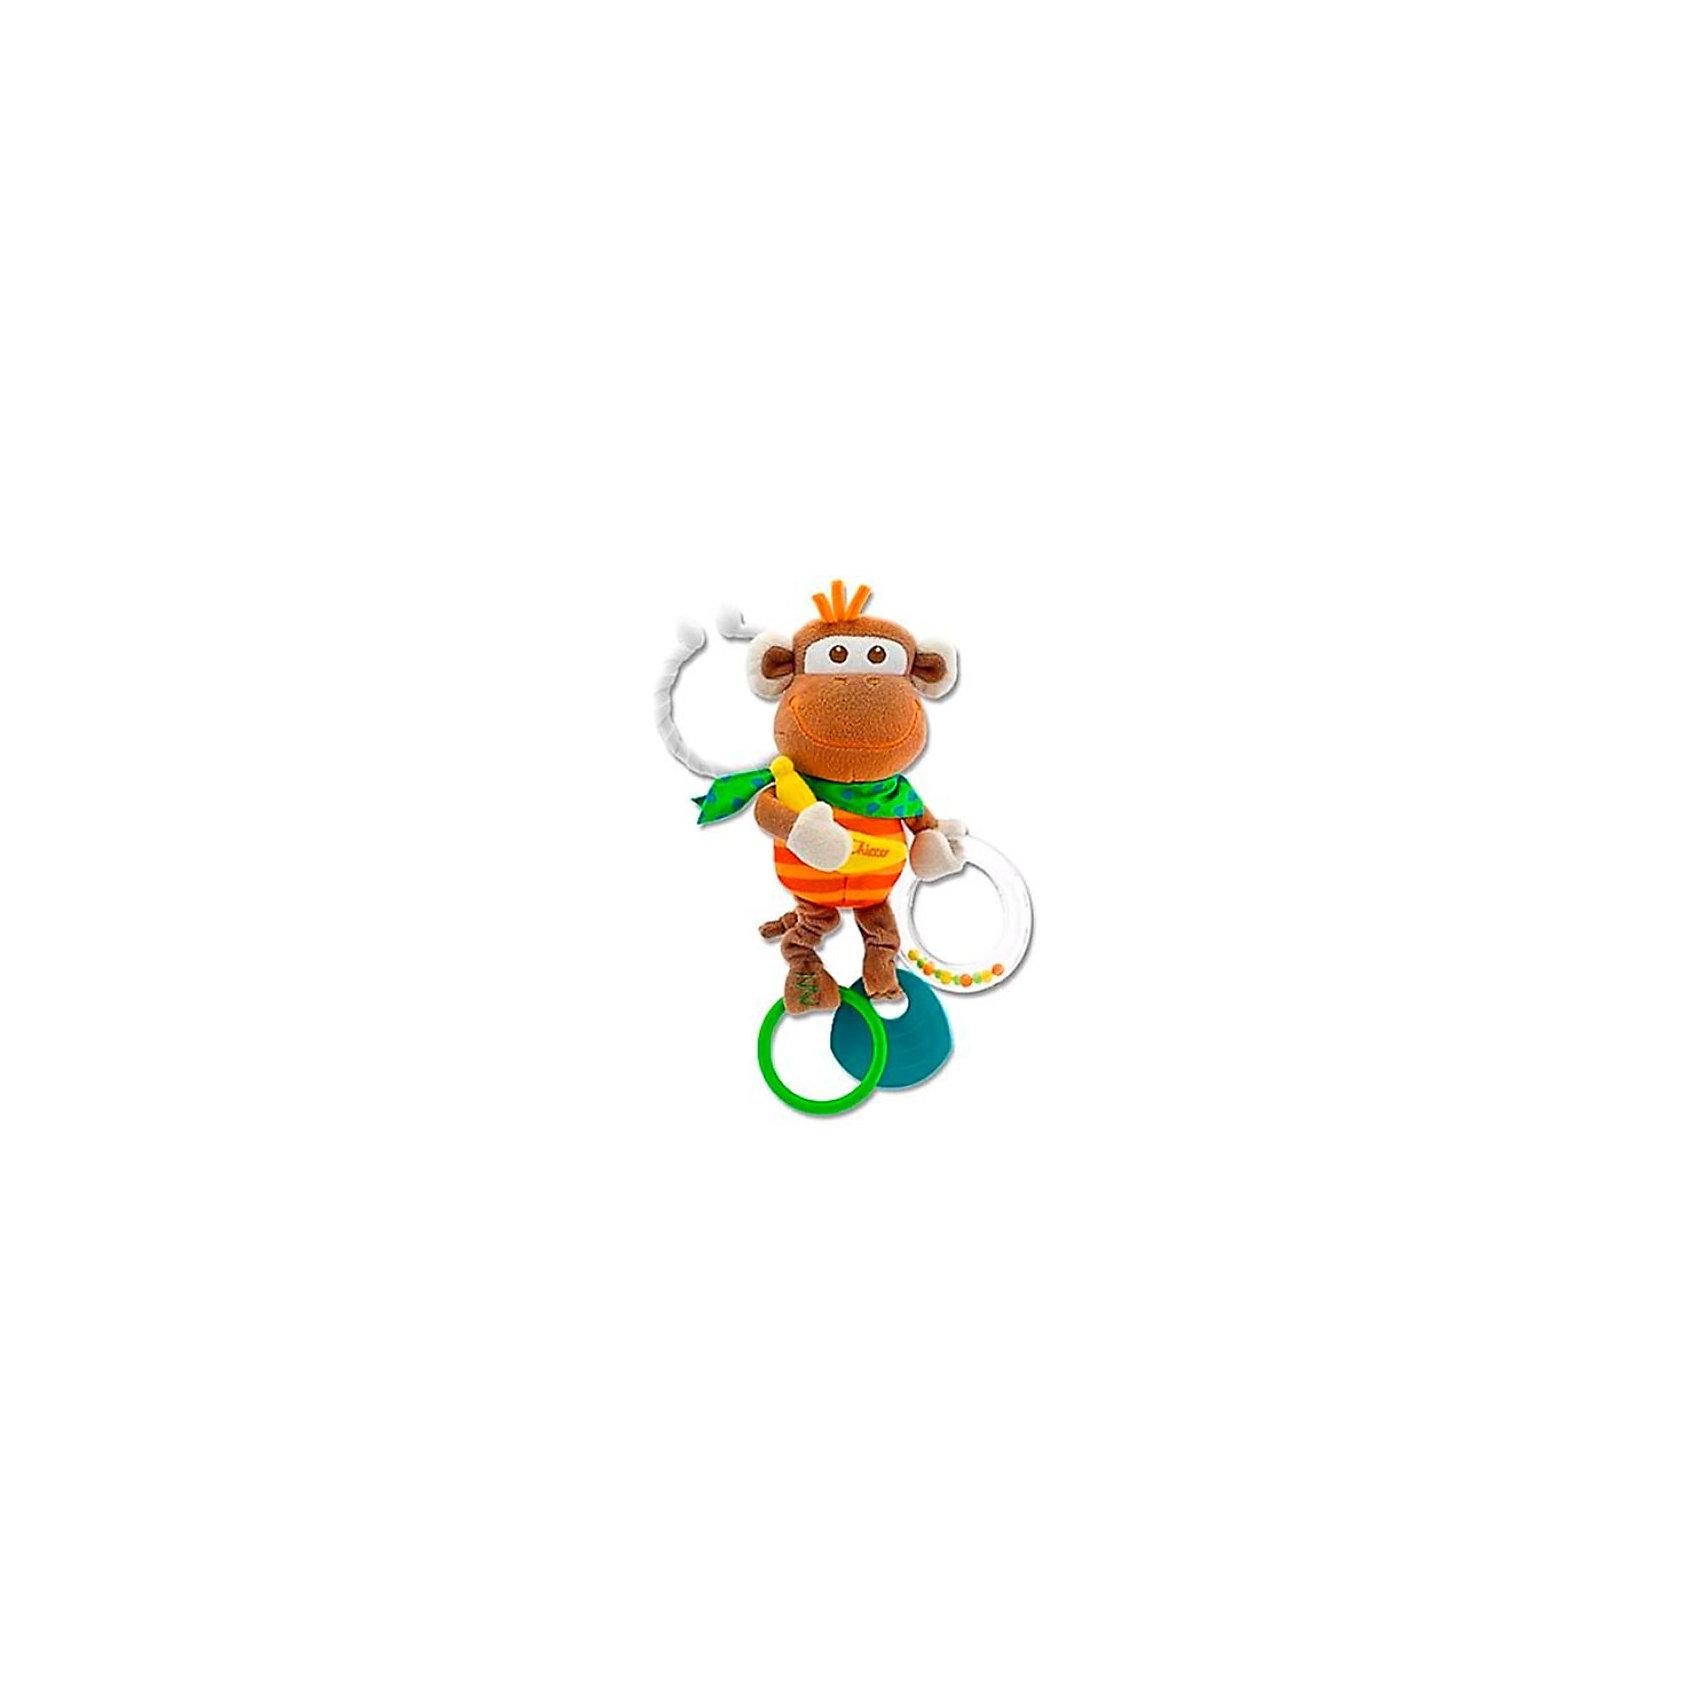 CHICCO Развивающая игрушка «Обезьянка», Chicco пуффи сув обезьянка с сердцем